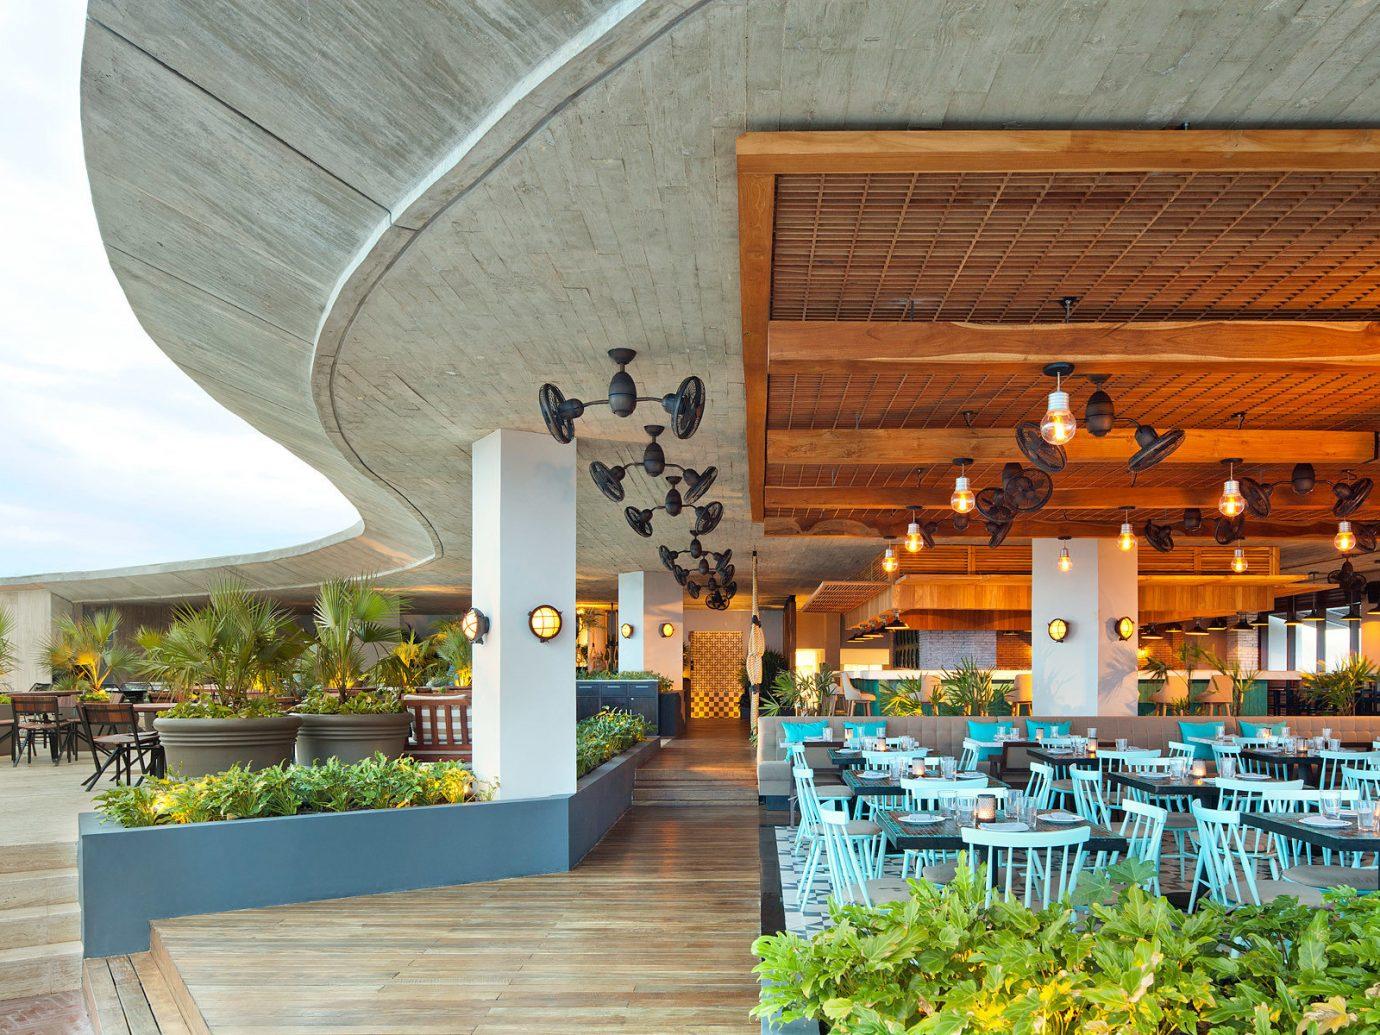 All-Inclusive Resorts Hotels Trip Ideas building Architecture estate plaza wood furniture